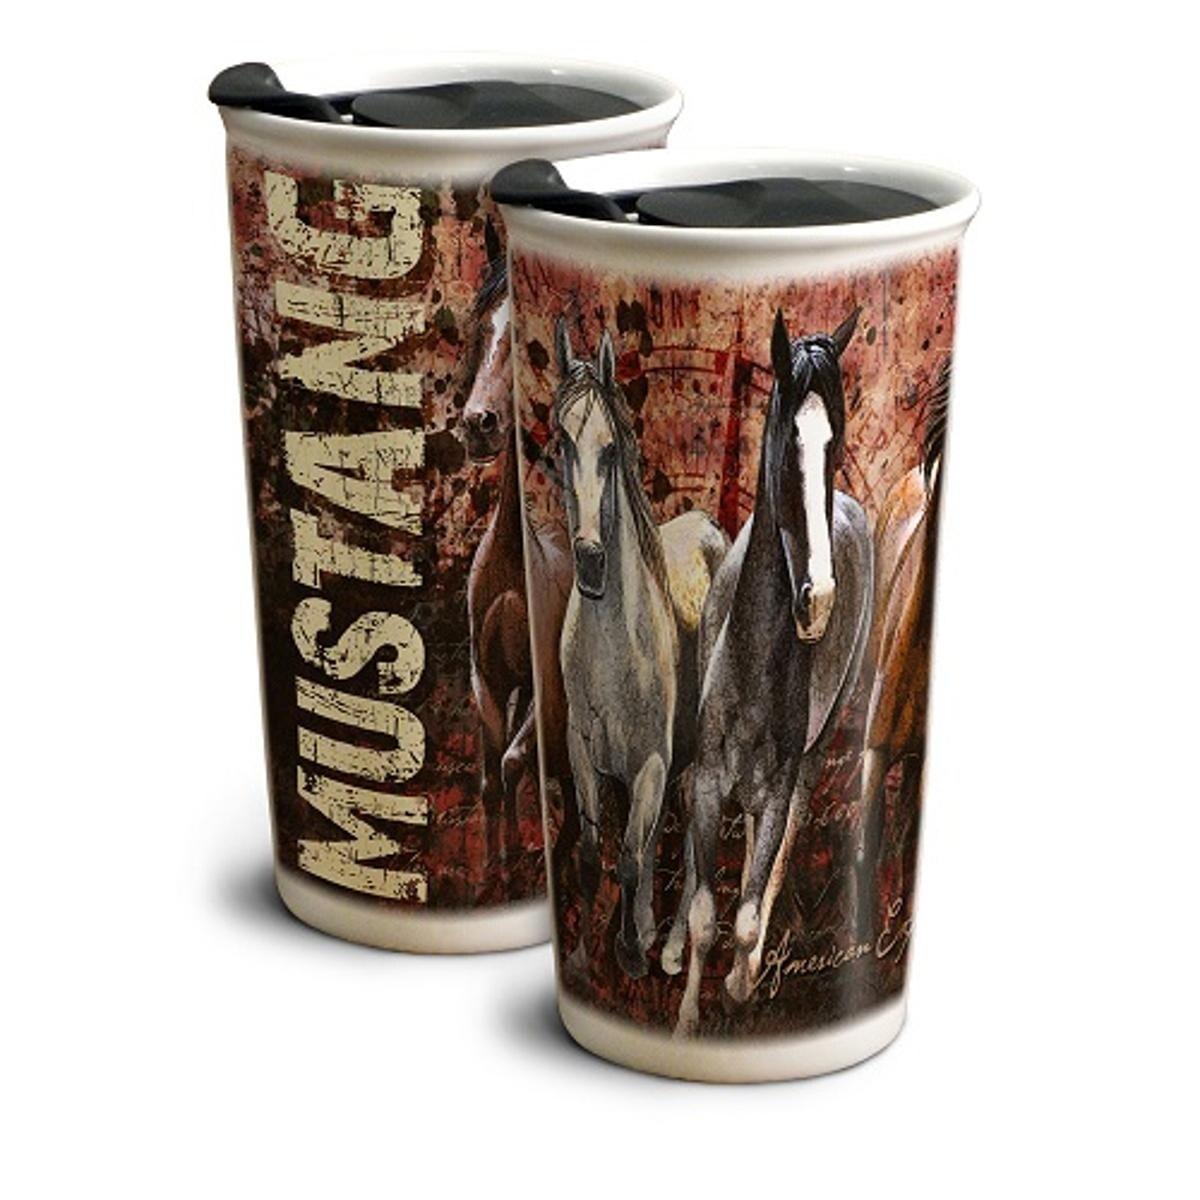 b87796e0e3e Shop American Expedition Mustang 12 oz. Ceramic Travel Mug - GCTM-110 -  Free Shipping On Orders Over $45 - Overstock.com - 17320065